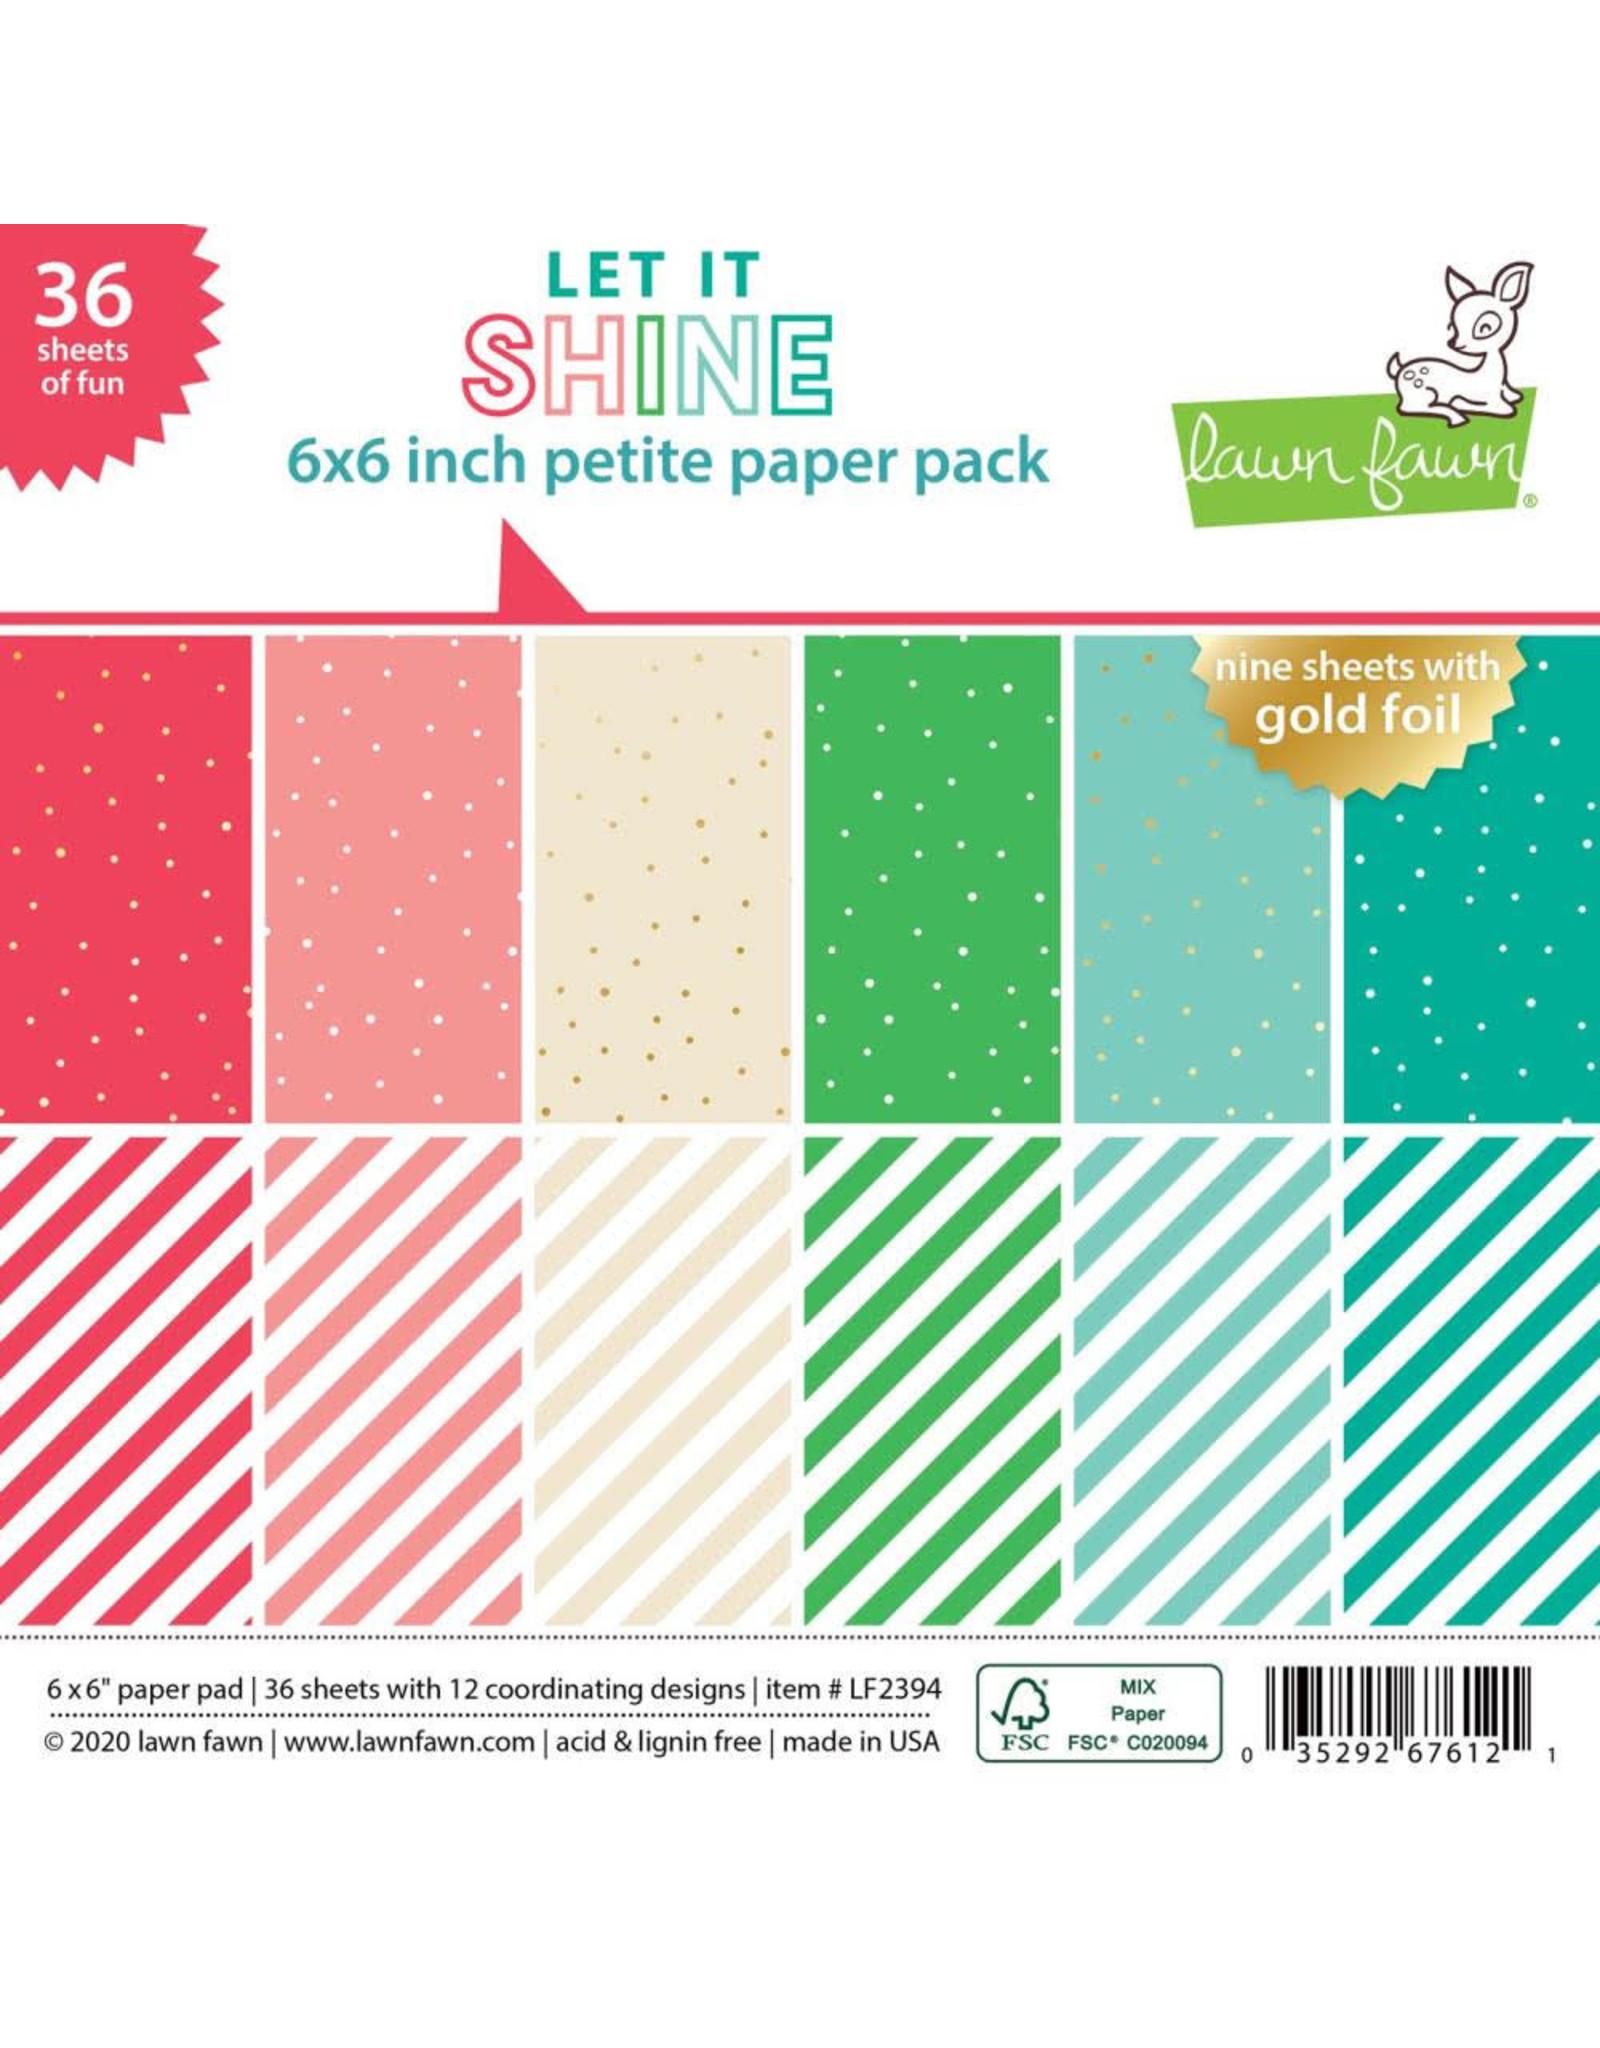 Lawn Fawn Let It Shine 6x6 Petite Paper Pack